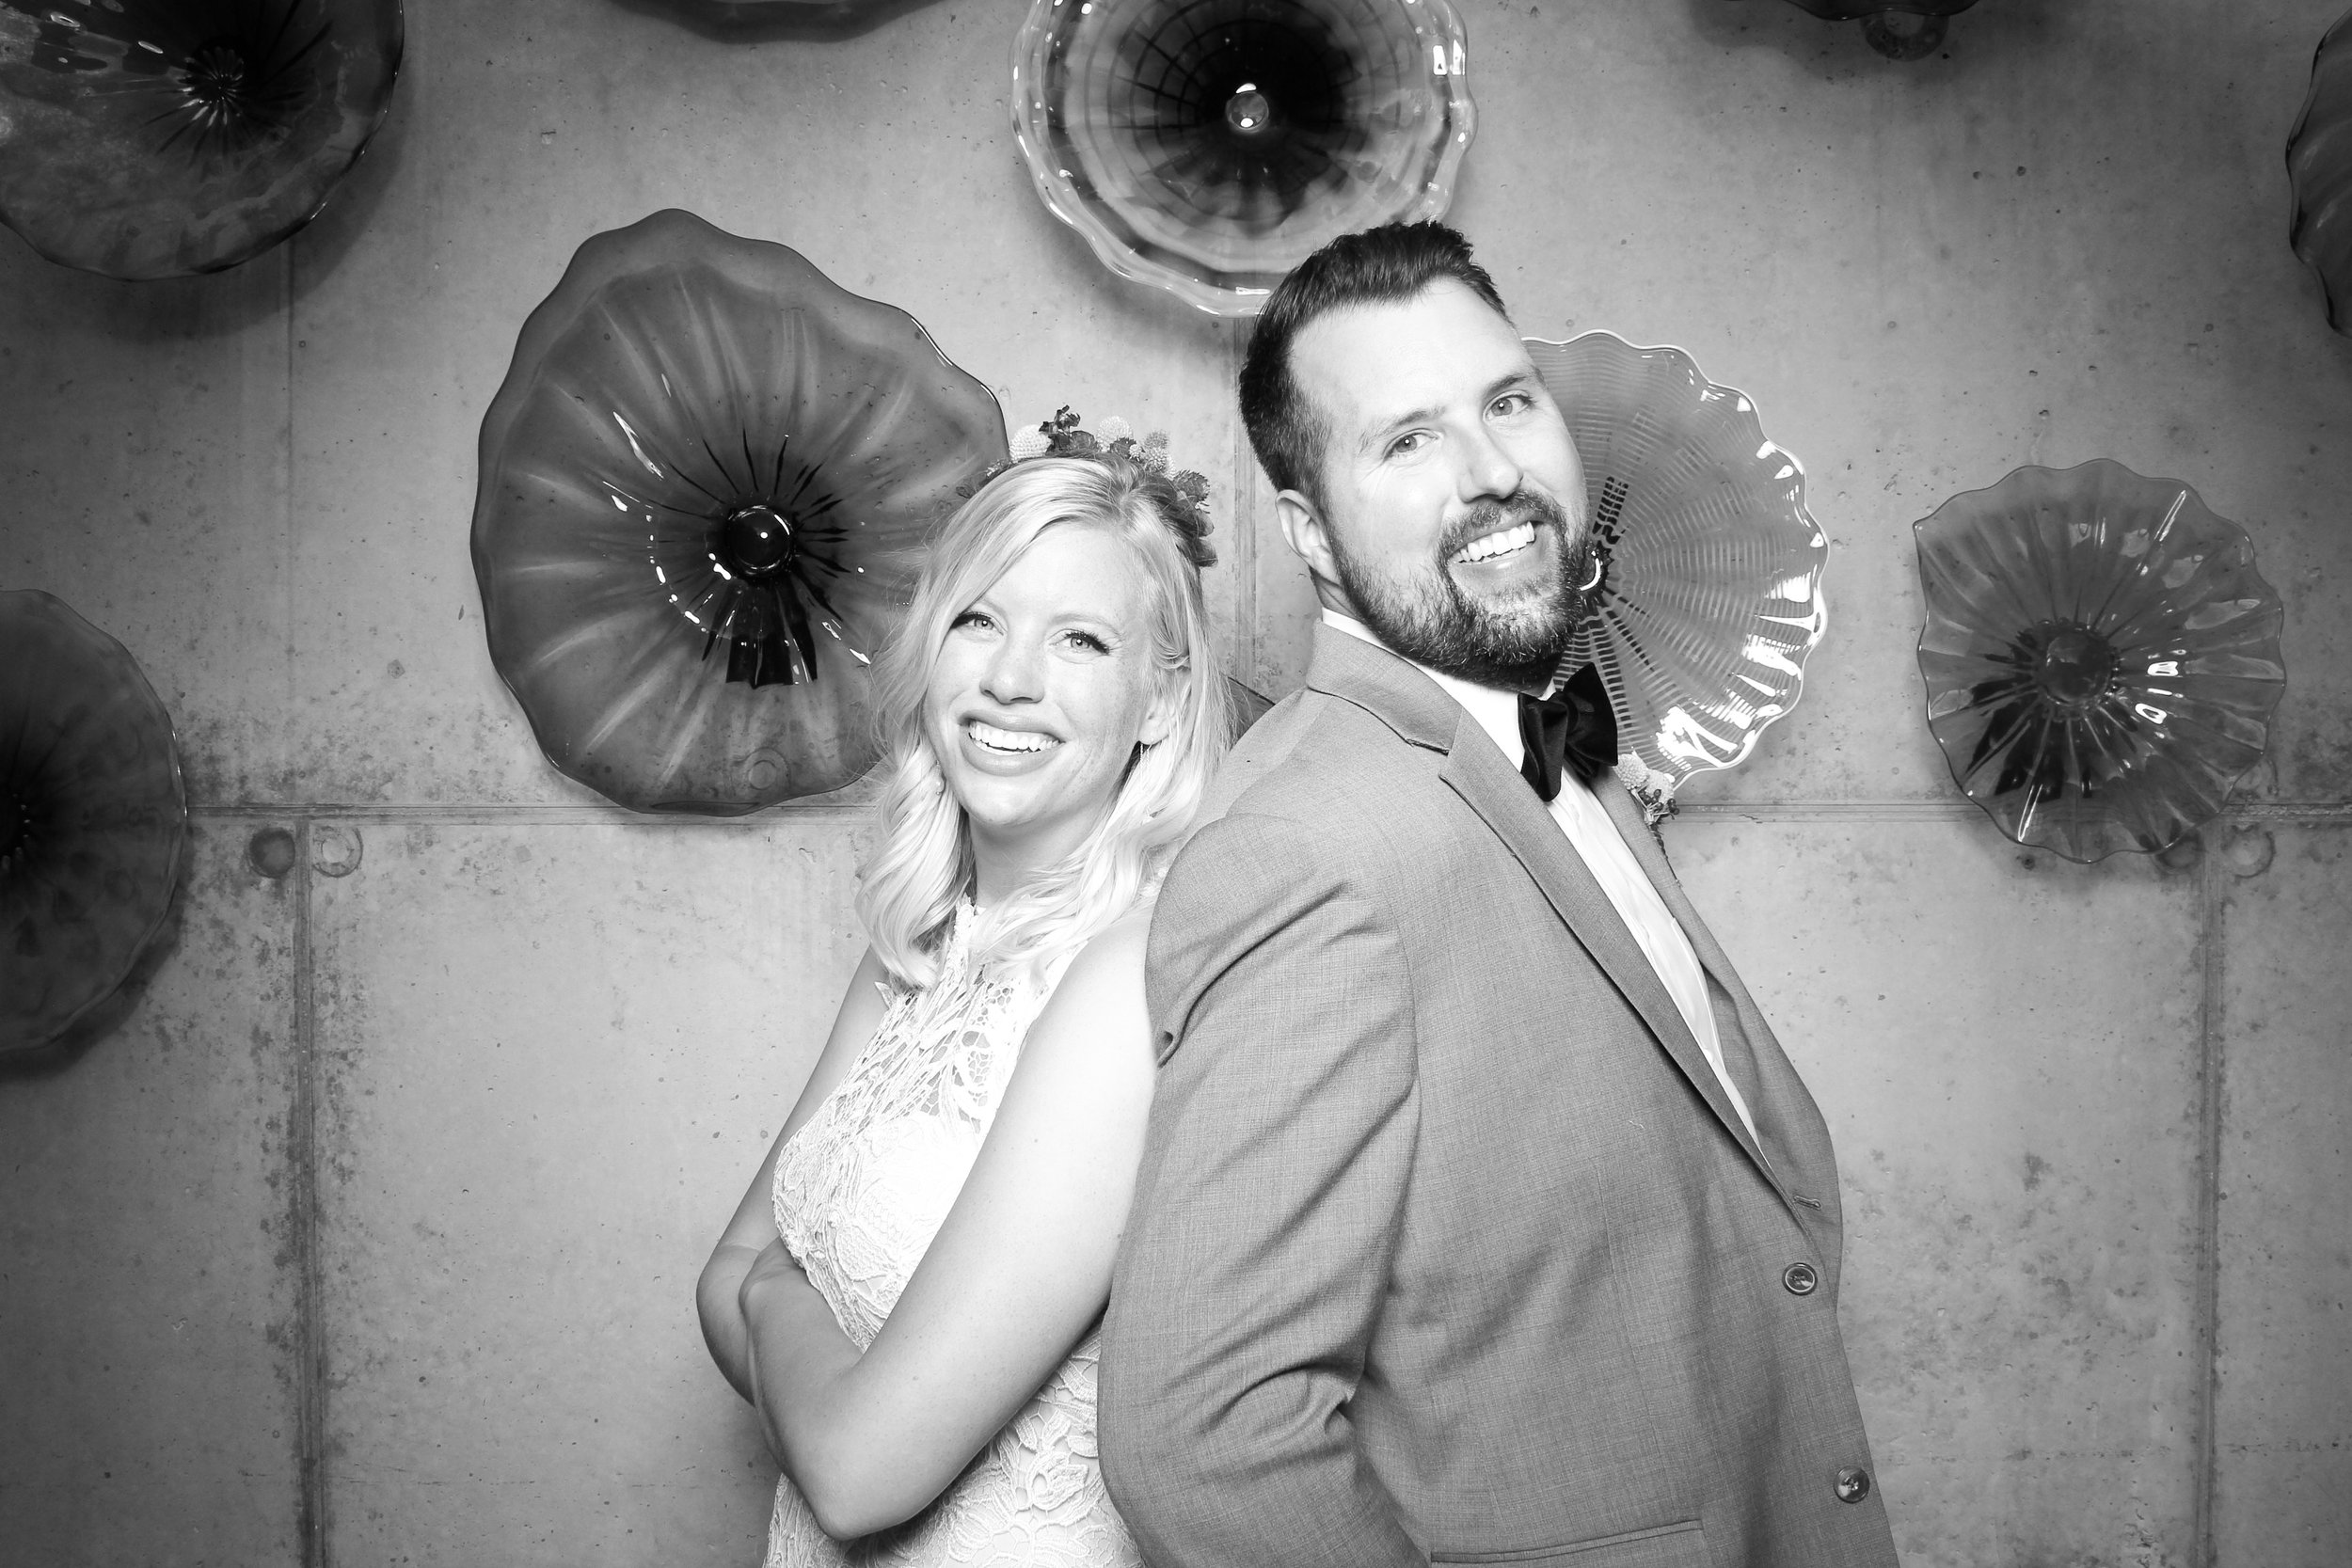 Chicago_Vintage_Wedding_Photobooth_Ignite_04.jpg